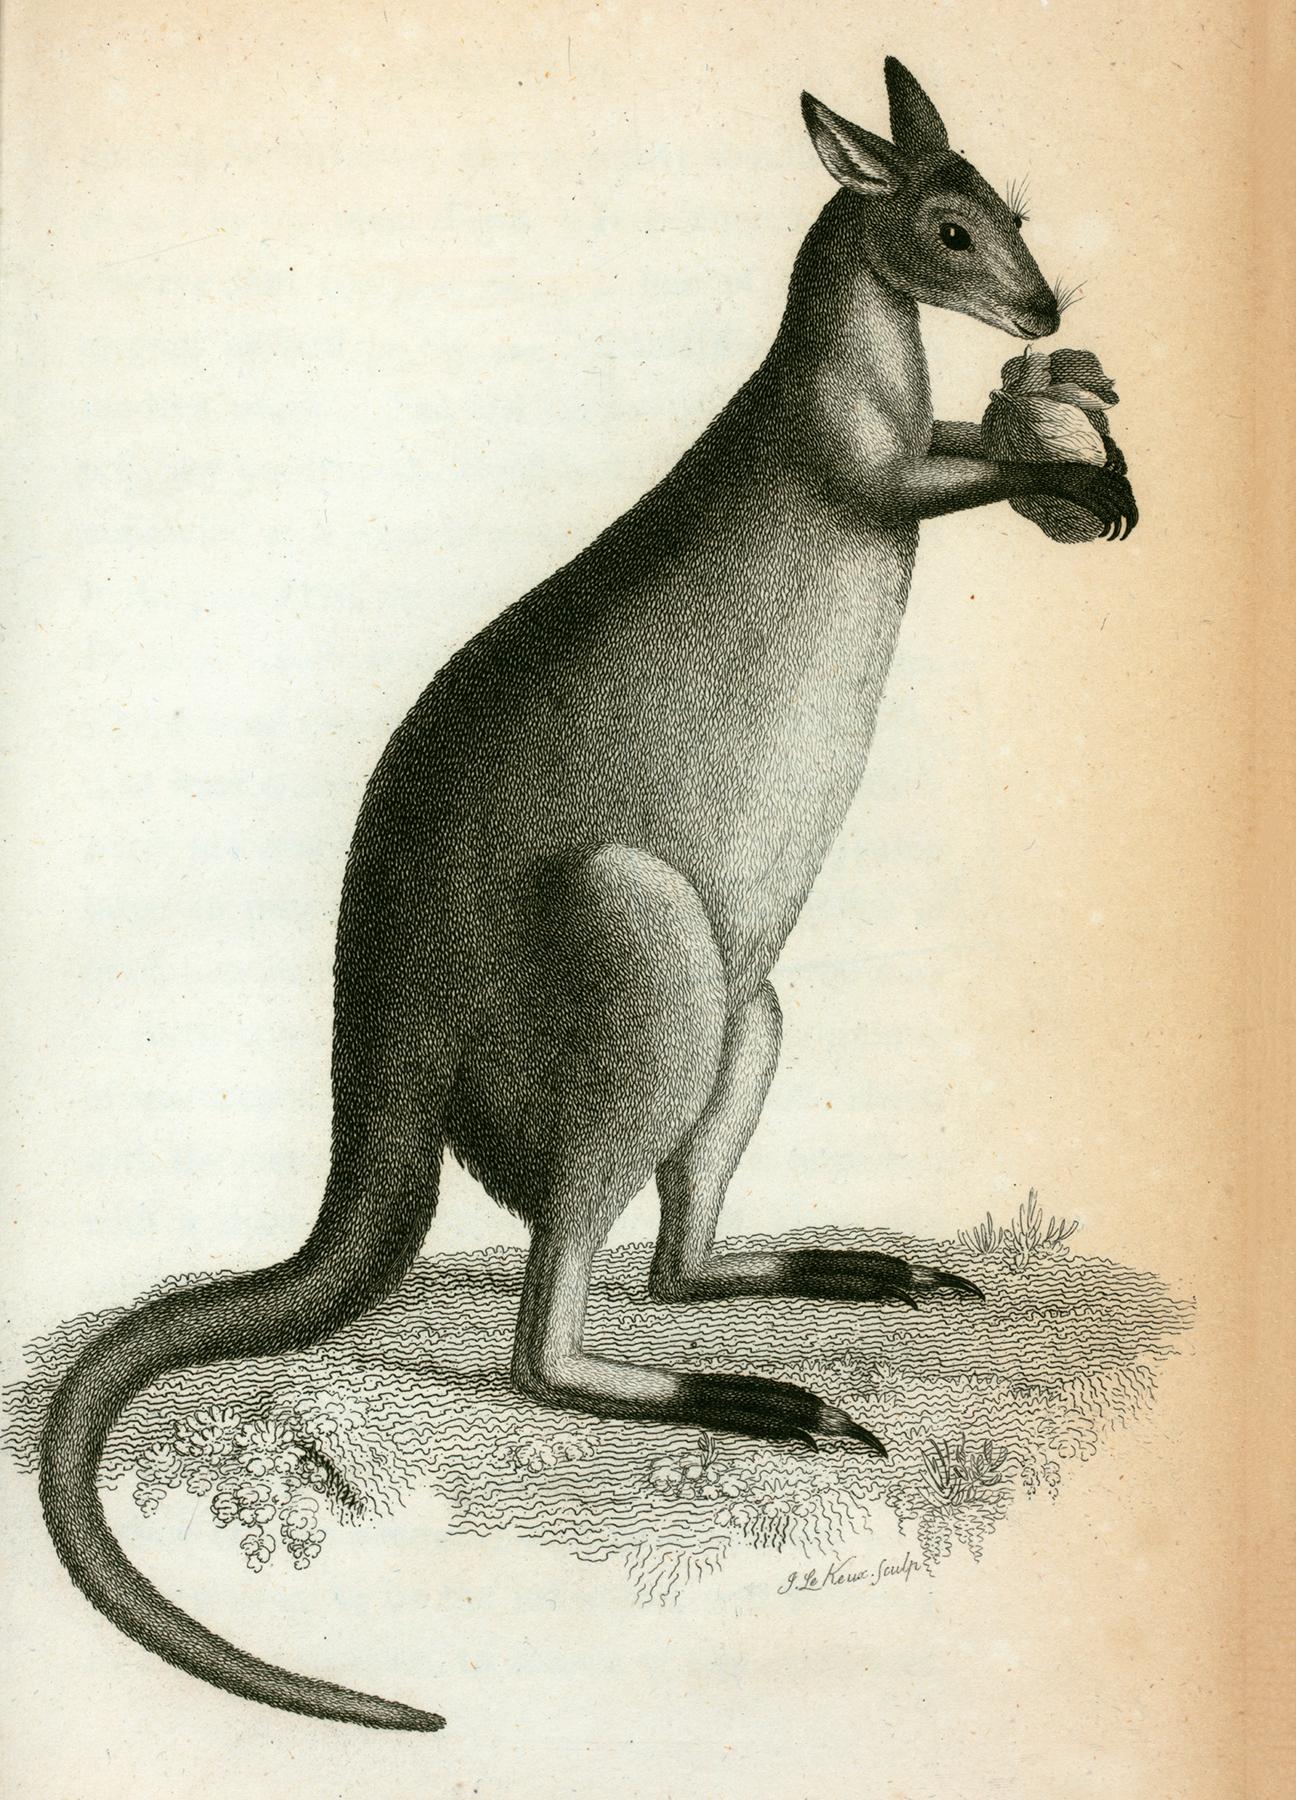 Vintage Natural History Kangaroo Image!.